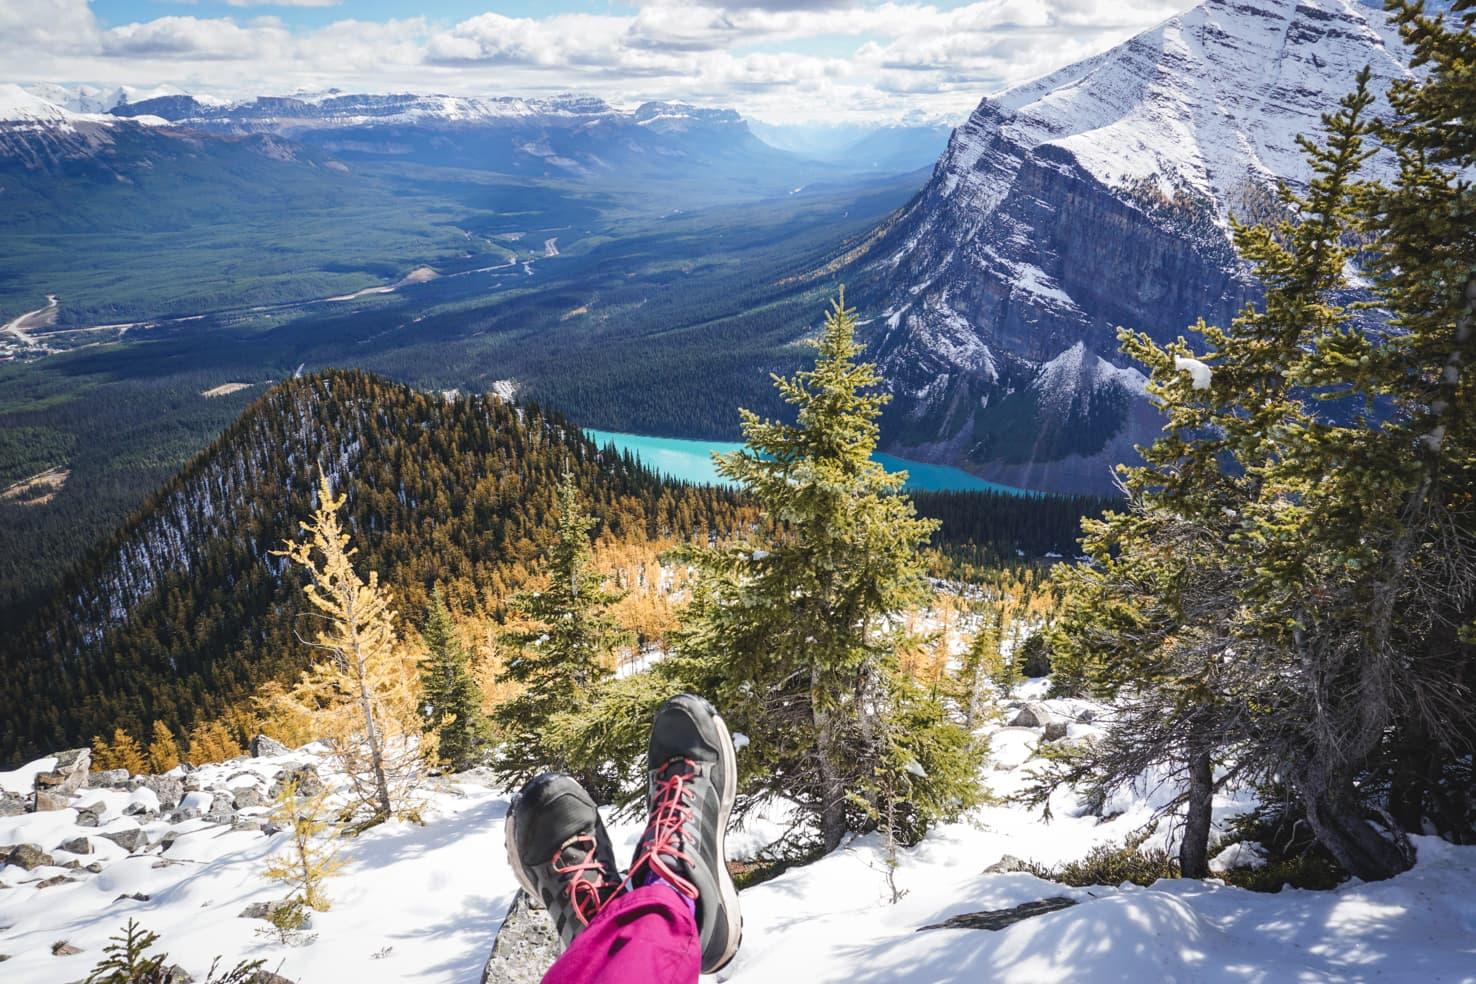 Banff Packing List - Mt. Saint Piran Hike above Lake Louise, Banff National Park